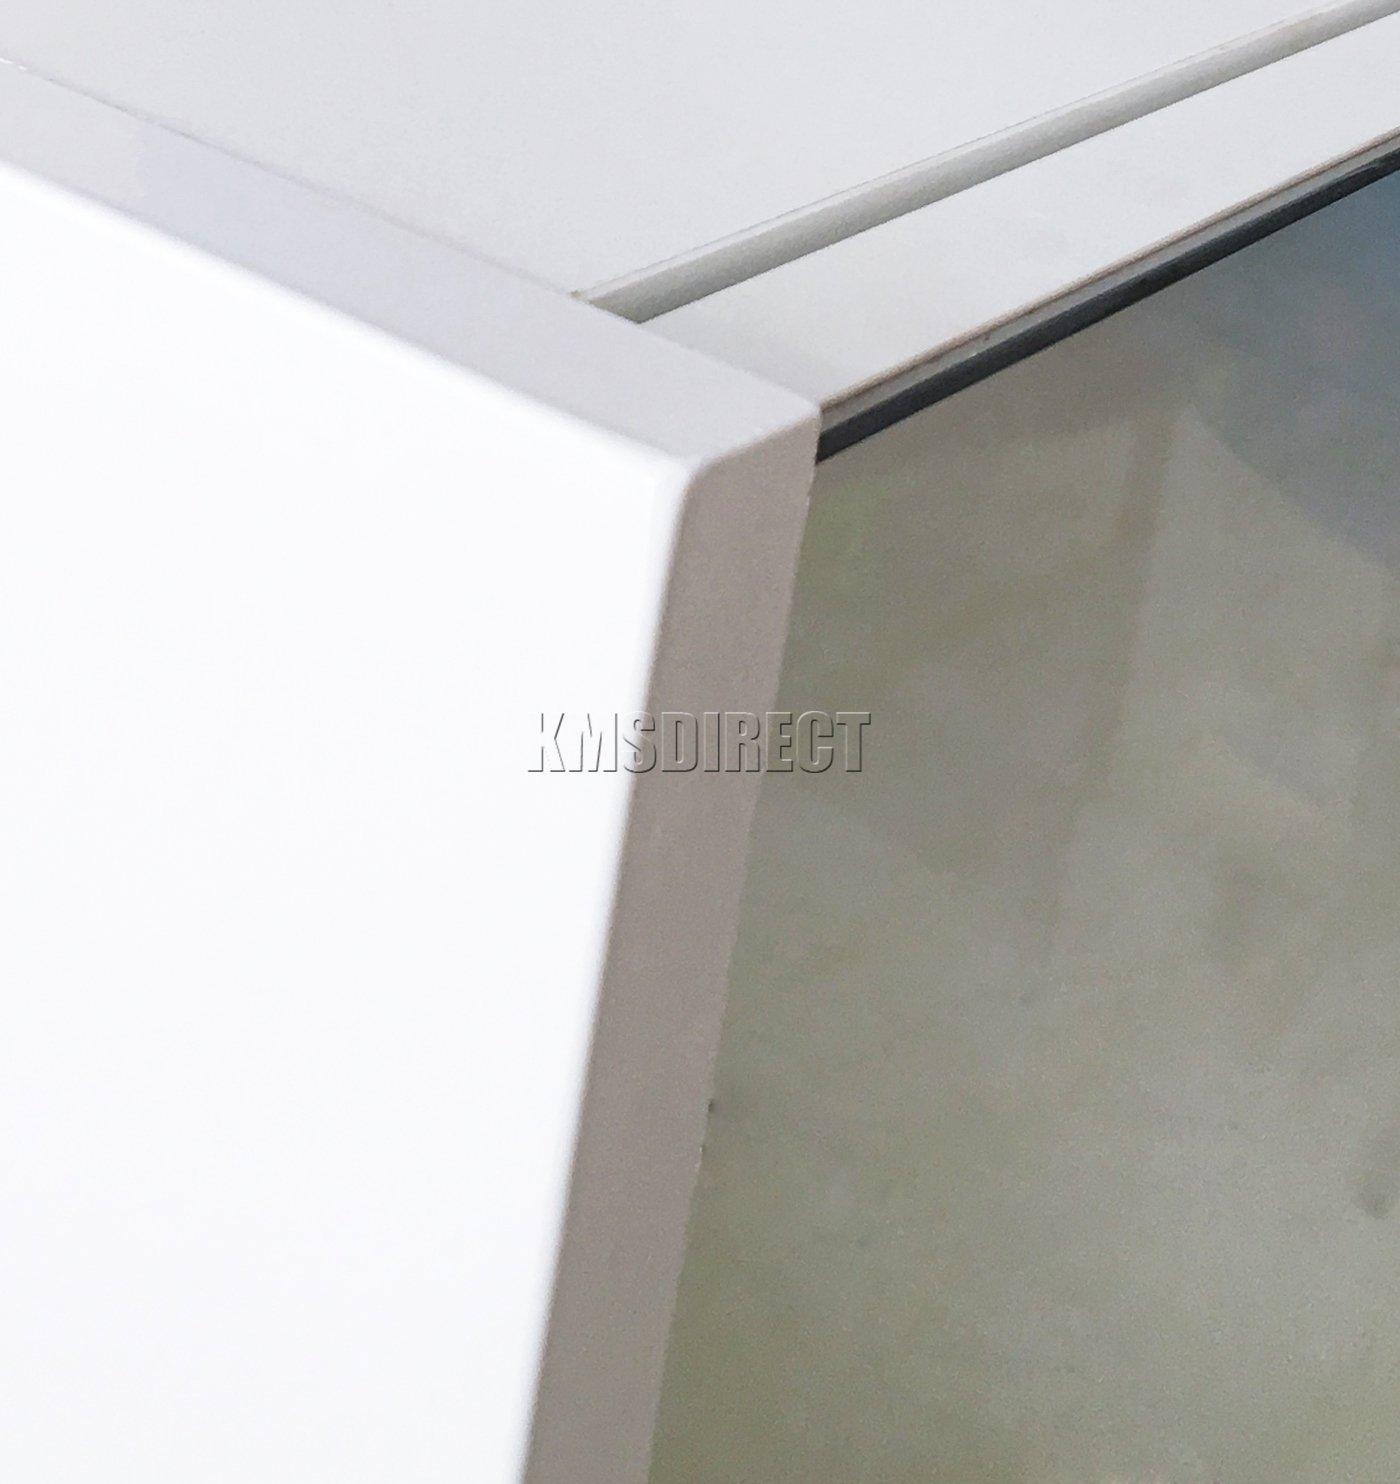 WestWood Triple 3 Door Wall Mount Mirror Bathroom Cabinet Unit Storage Cupboard with Shelf White New BC02